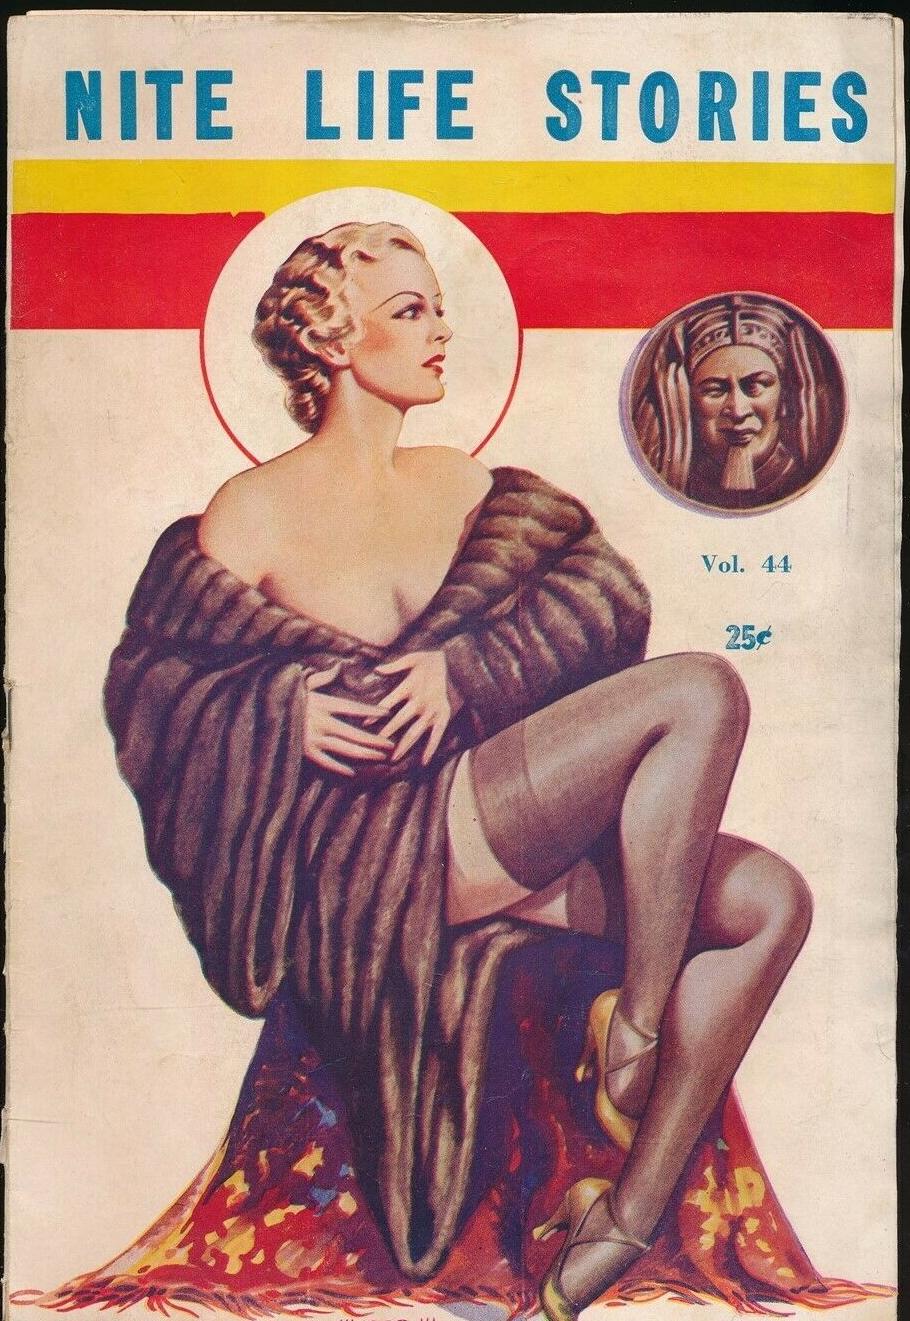 Nite Life Stories - 1930s?